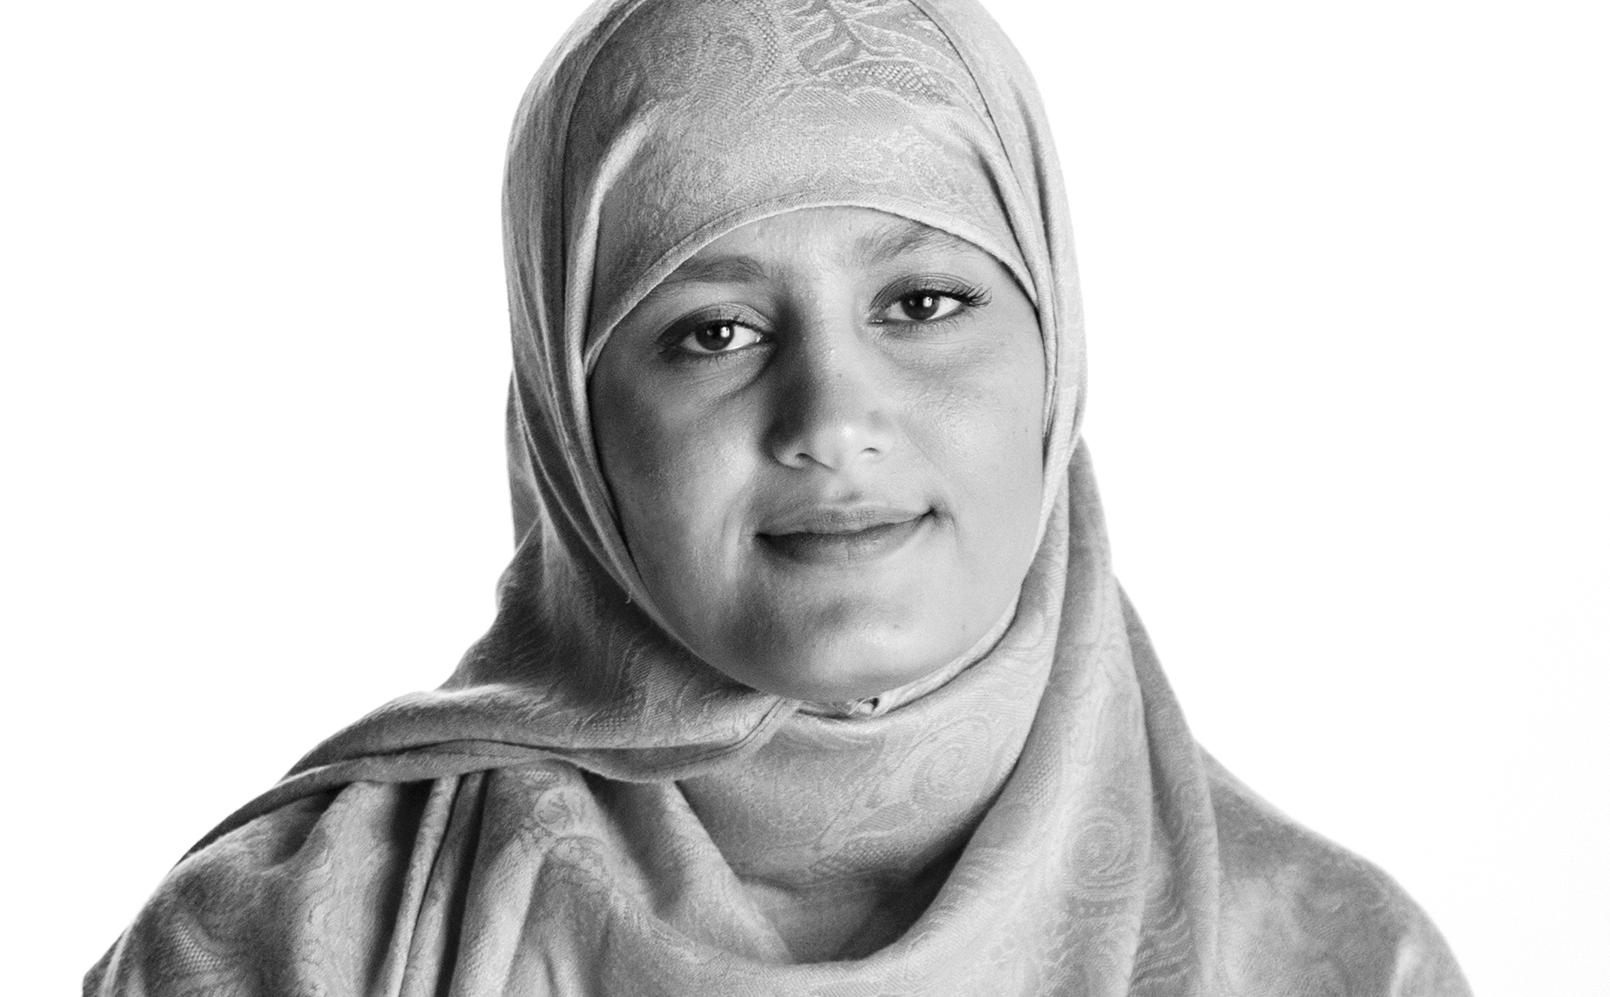 Maleeha Asif